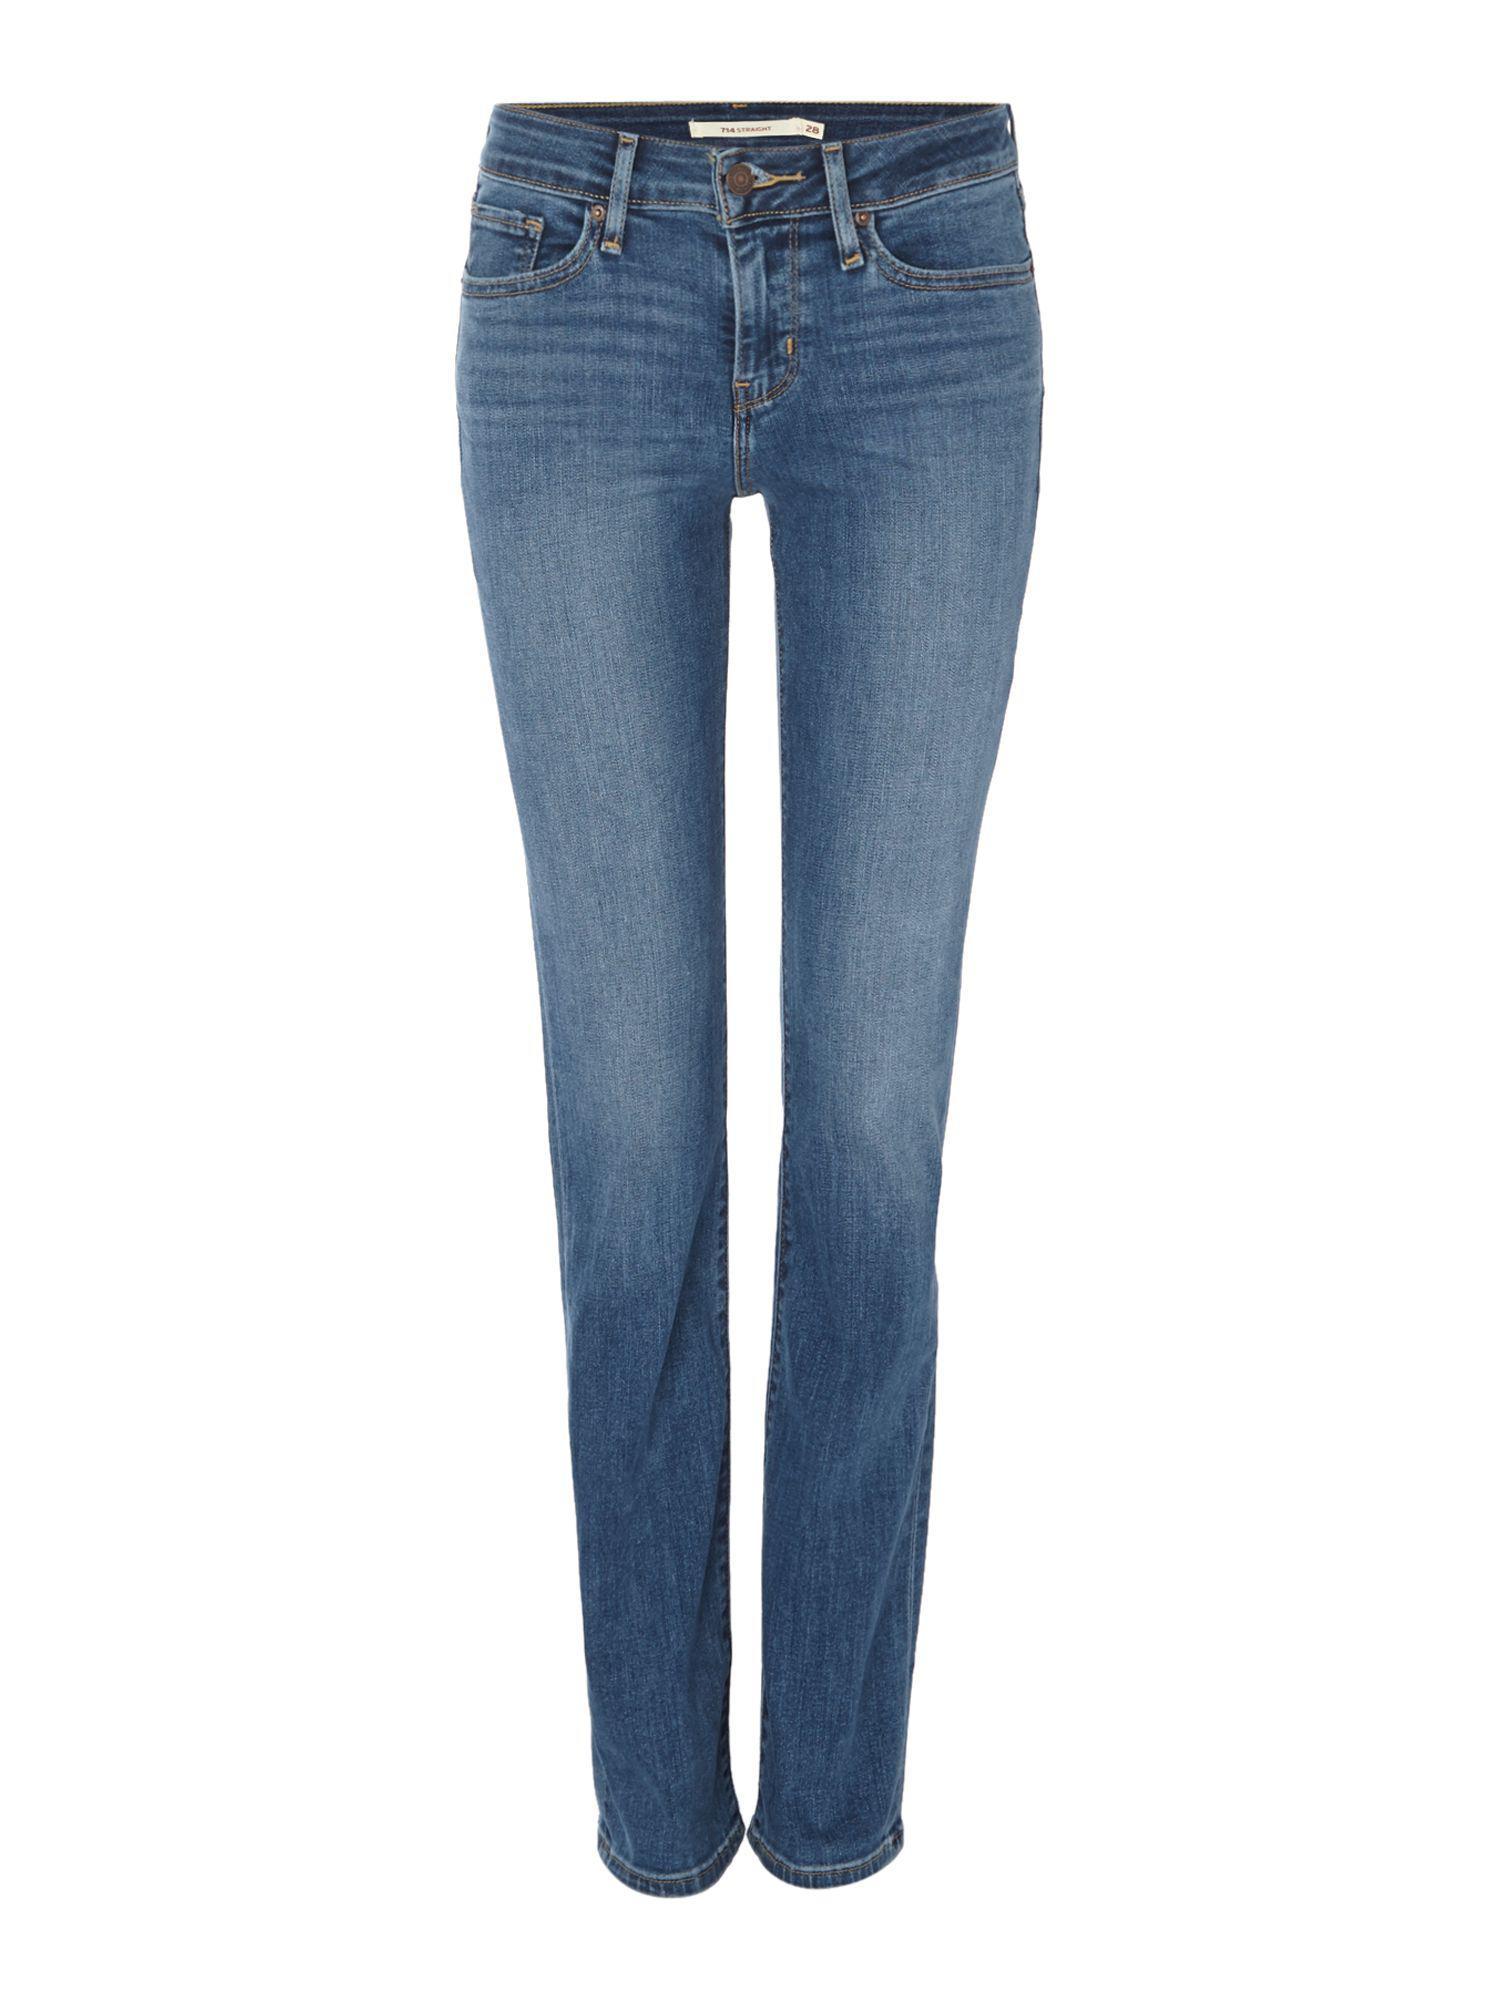 2f067a2f Lyst - Levi's 714 Straight Leg Jean In Blue Vista in Blue